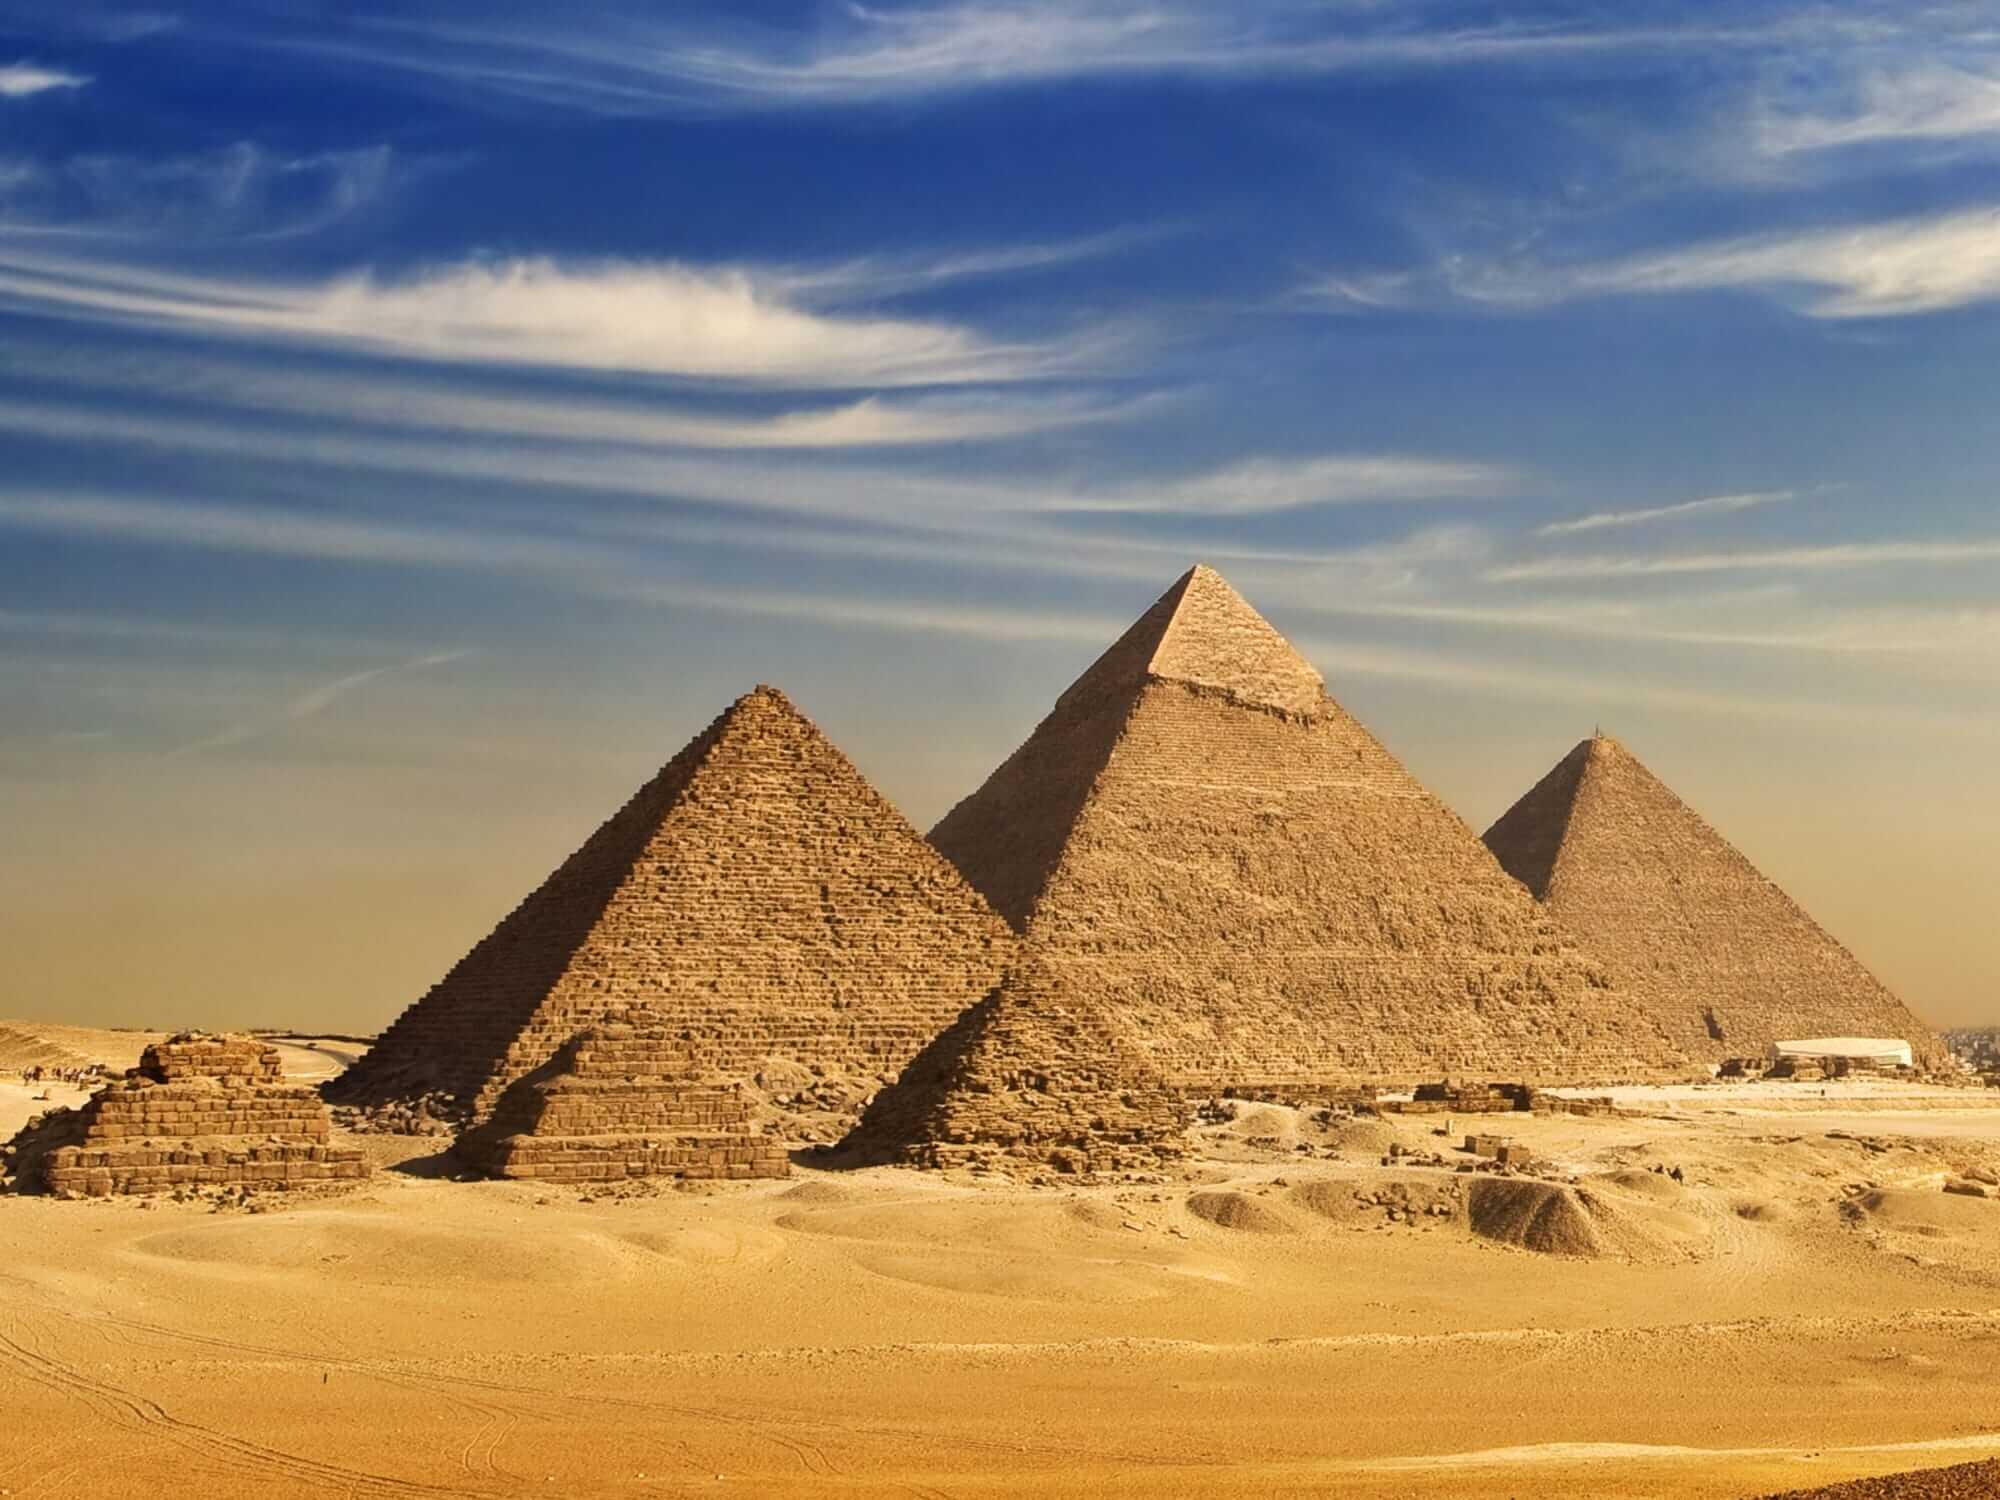 keajaiban-dunia-piramida-giza